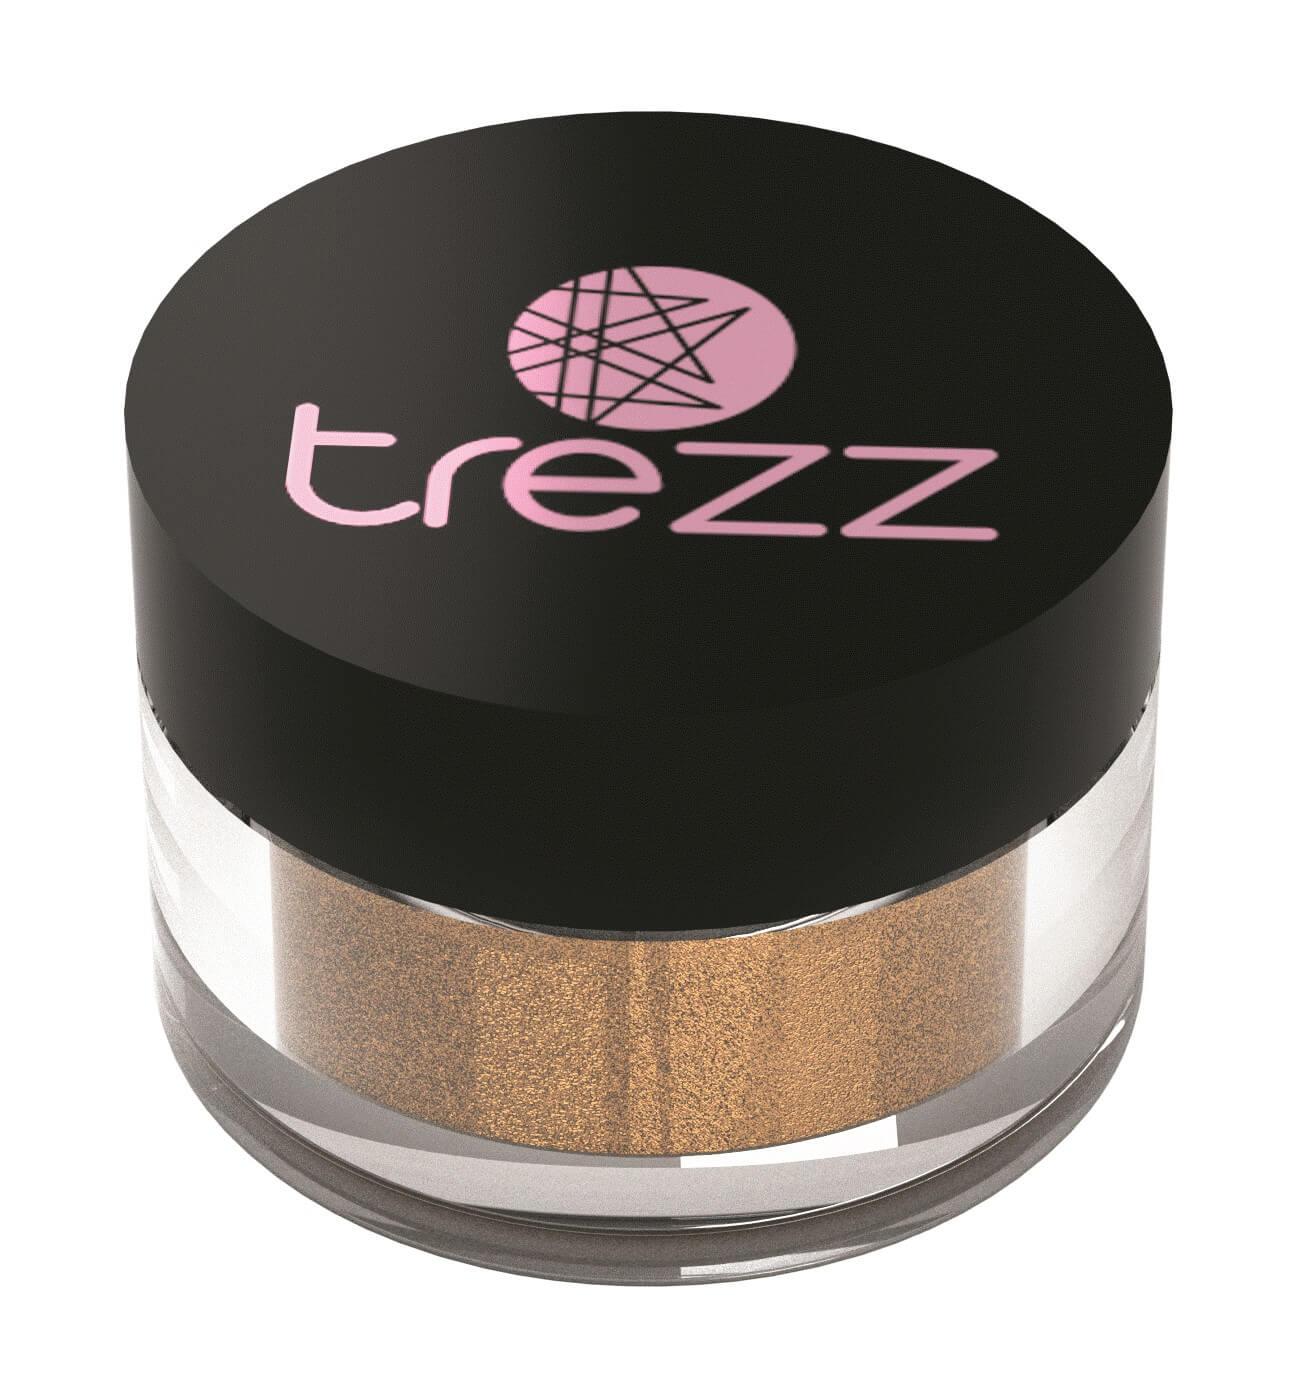 Iluminador Trezz 4g - Sunshine